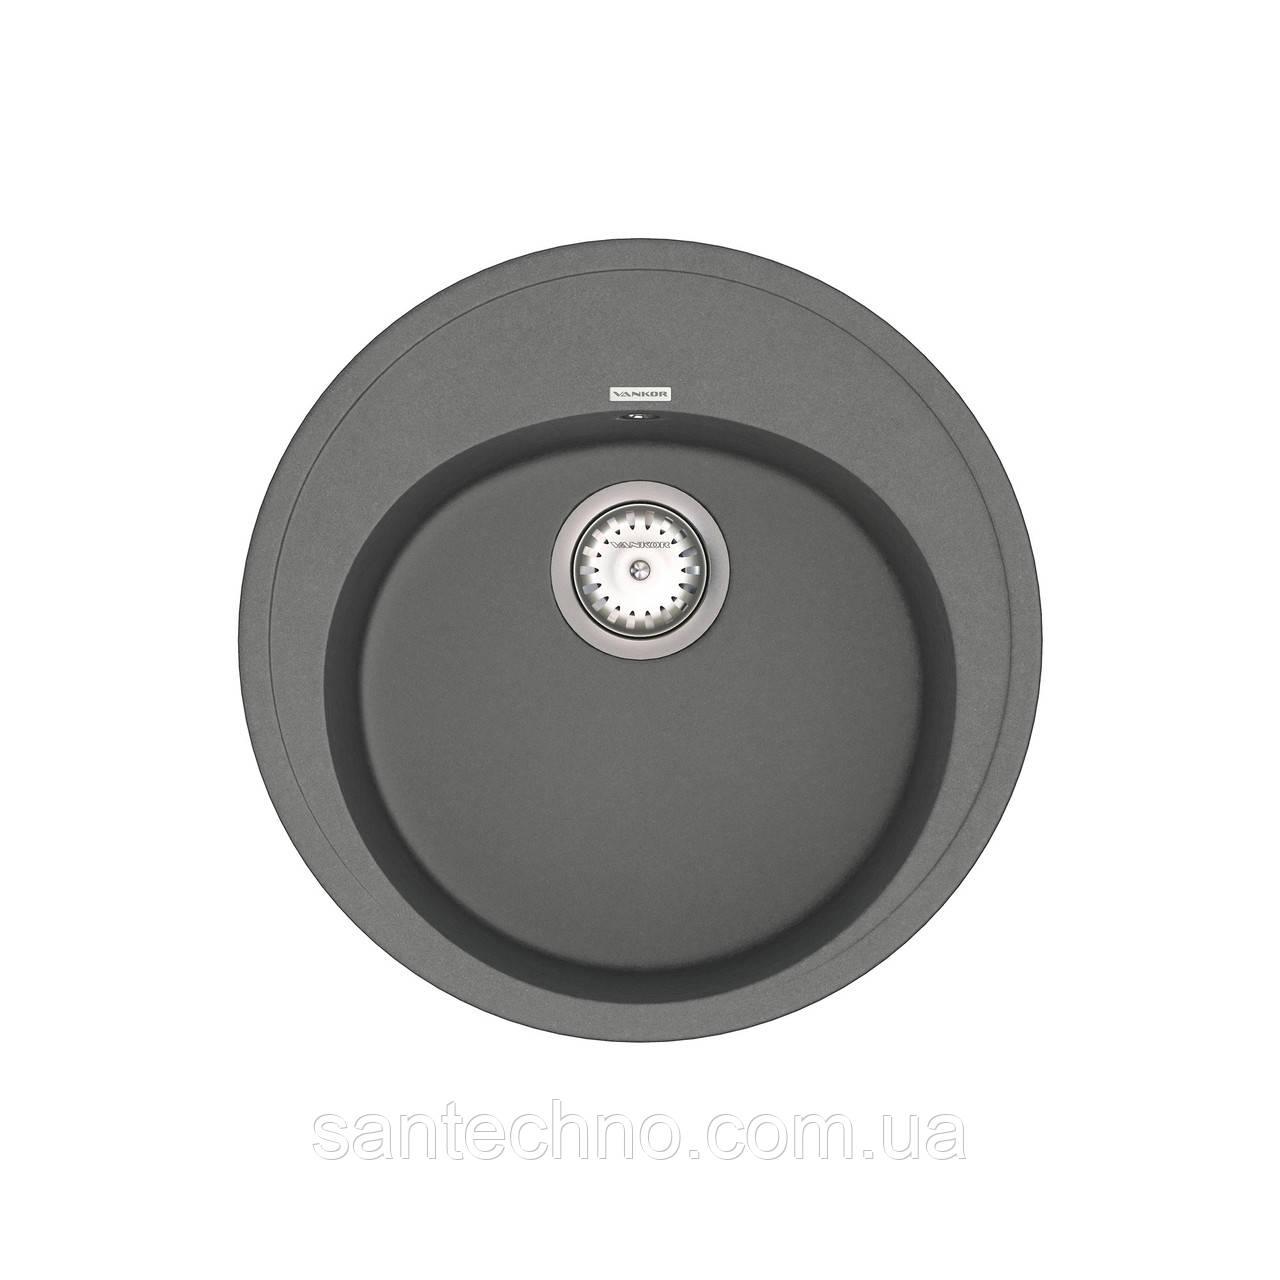 Кухонная мойка из камня  VANKOR Sity SMR 01.50 Gray + сифон VANKOR